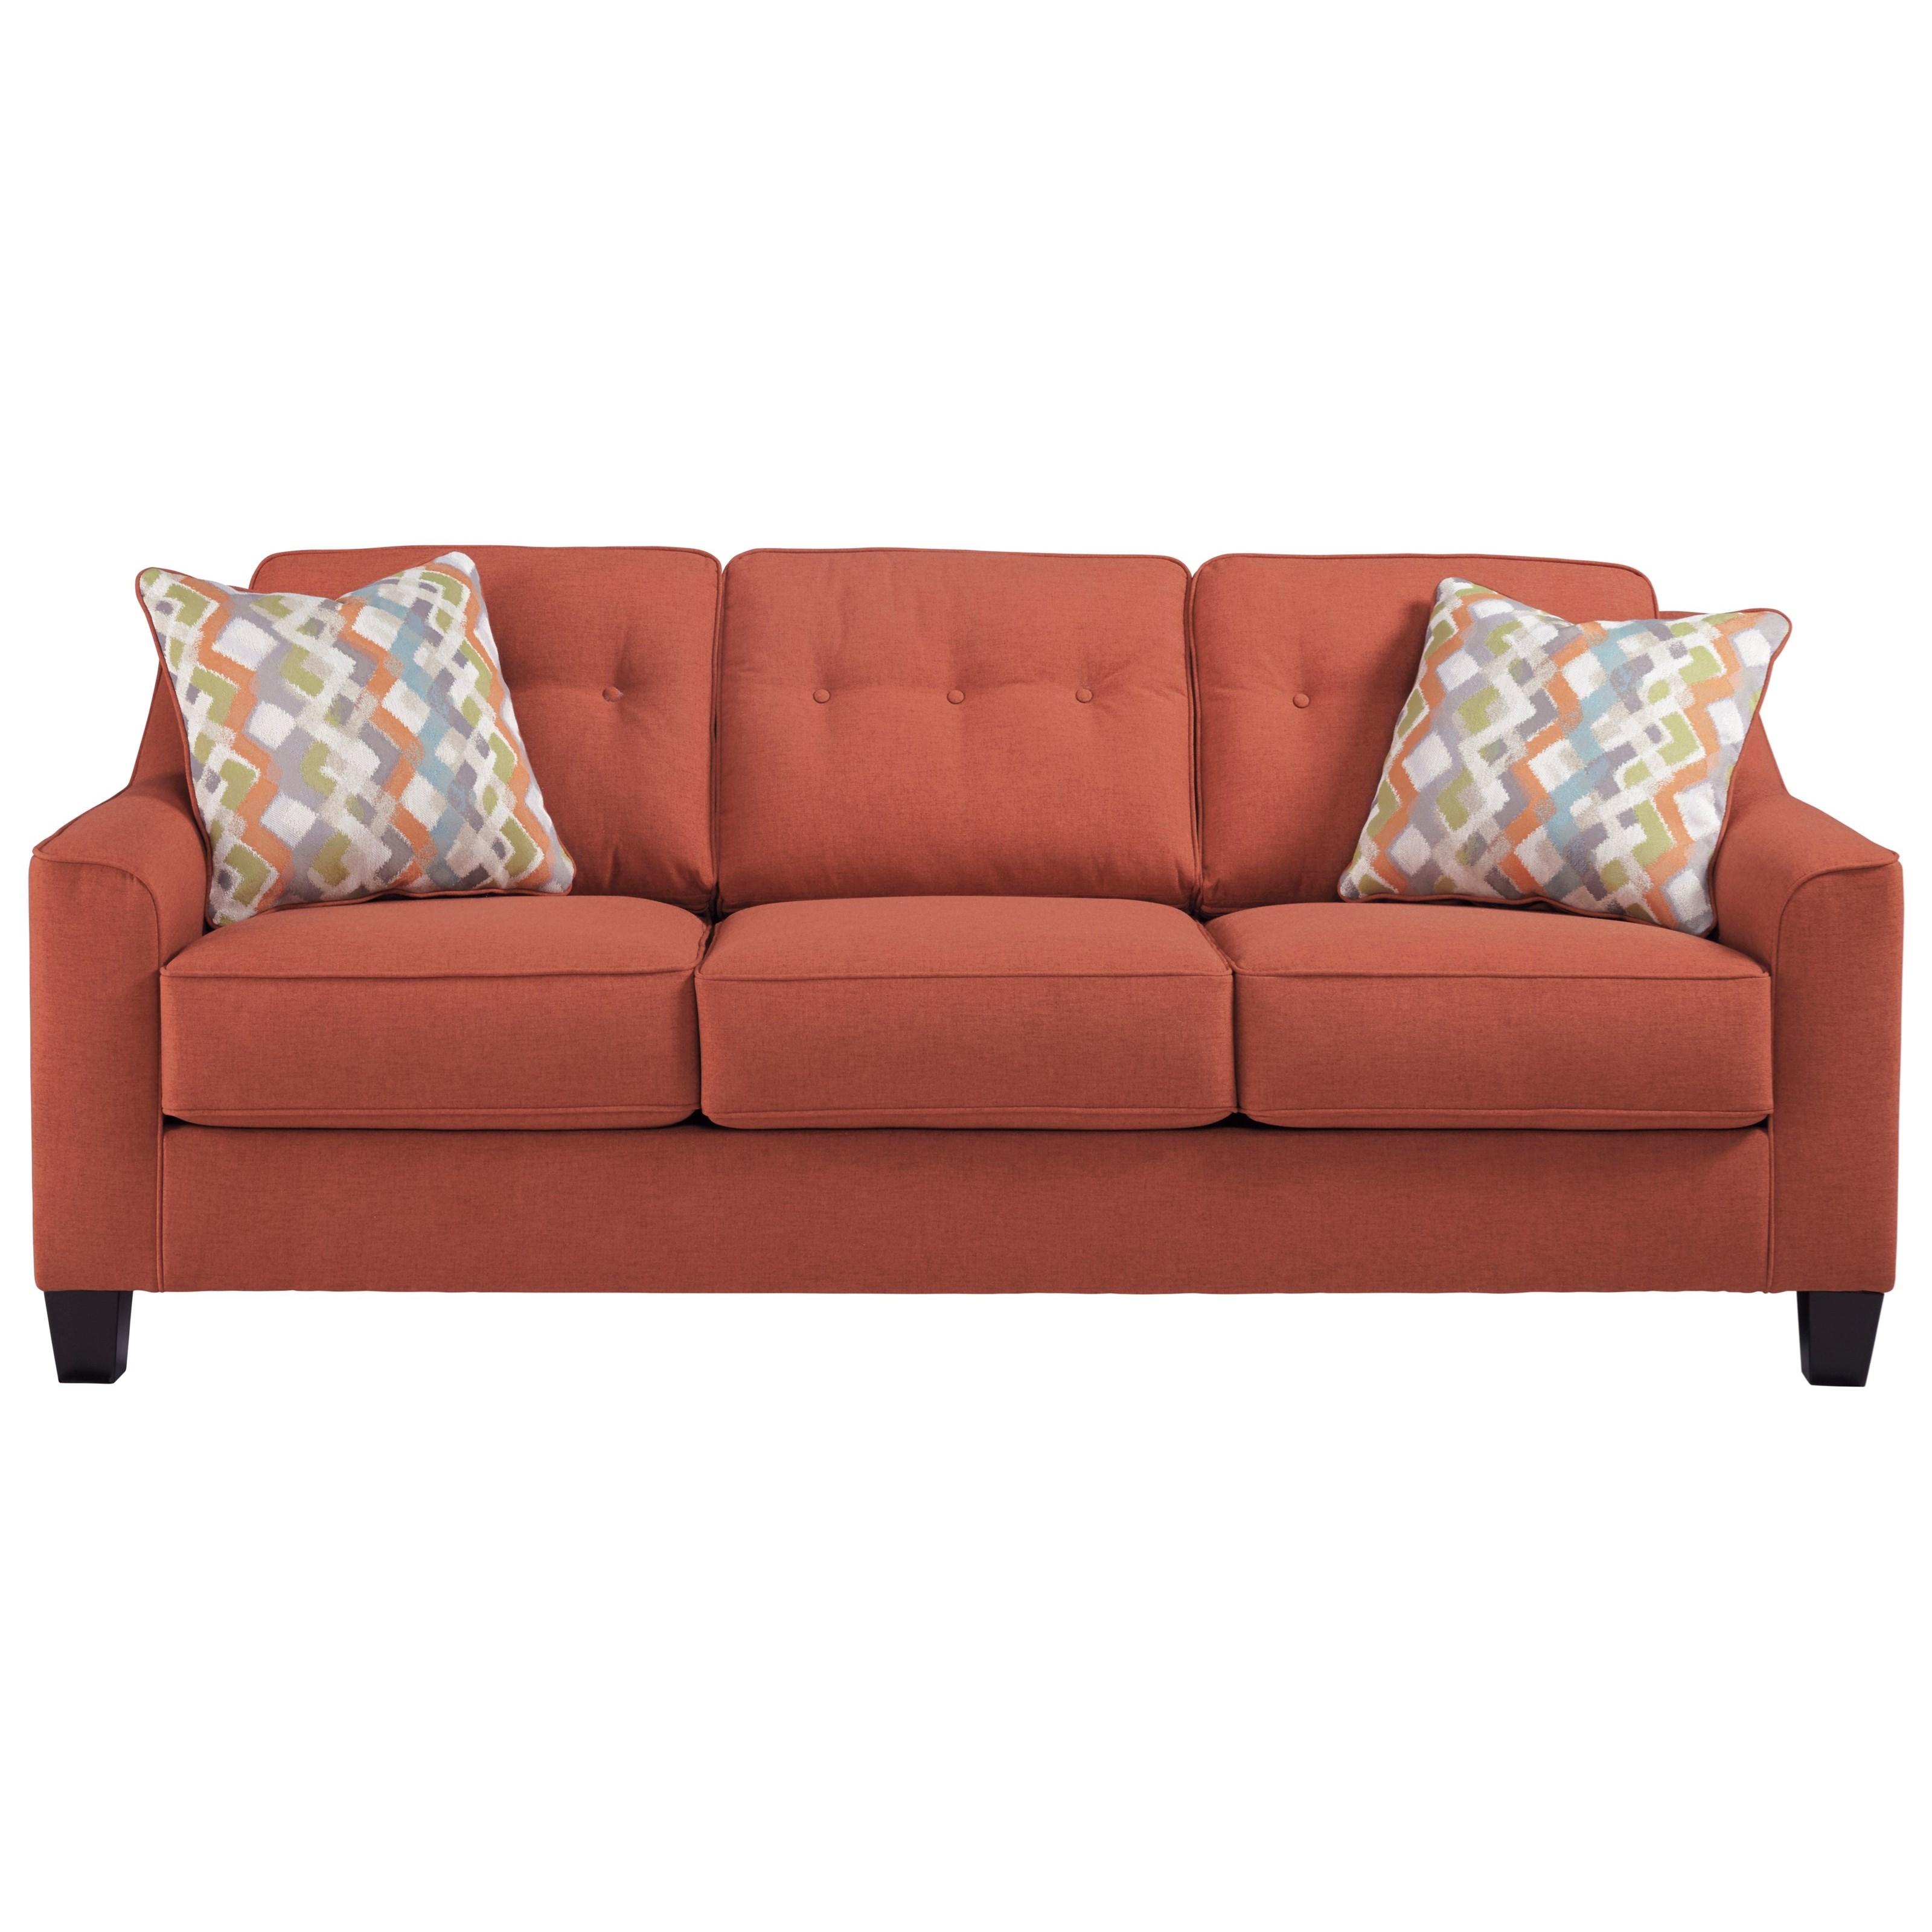 Menga Sofa by Ashley Furniture at Lapeer Furniture & Mattress Center